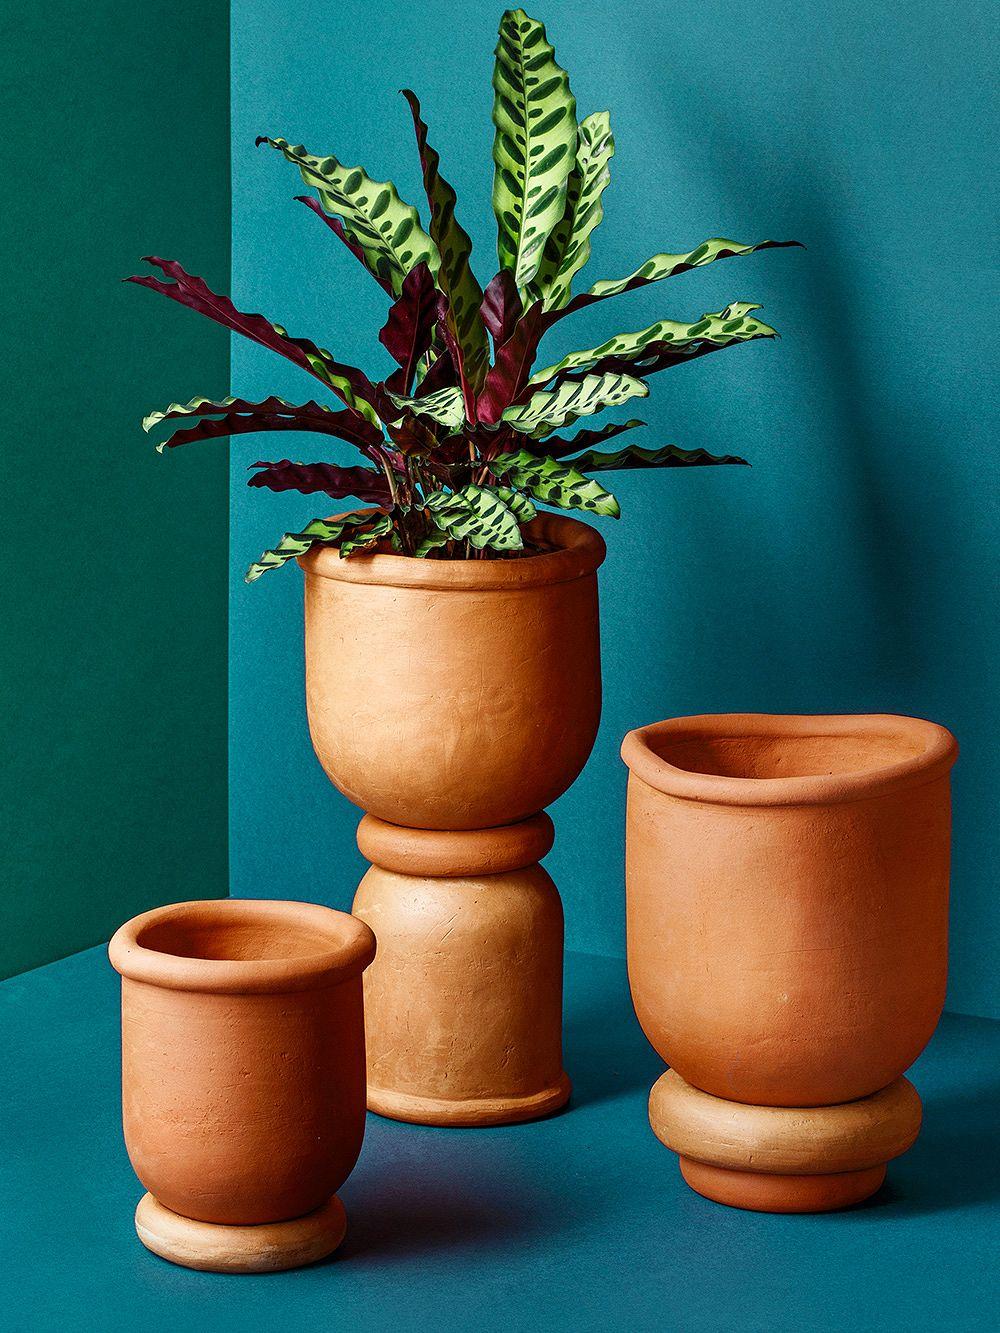 Tero Kuitunen's Mix & Match vases